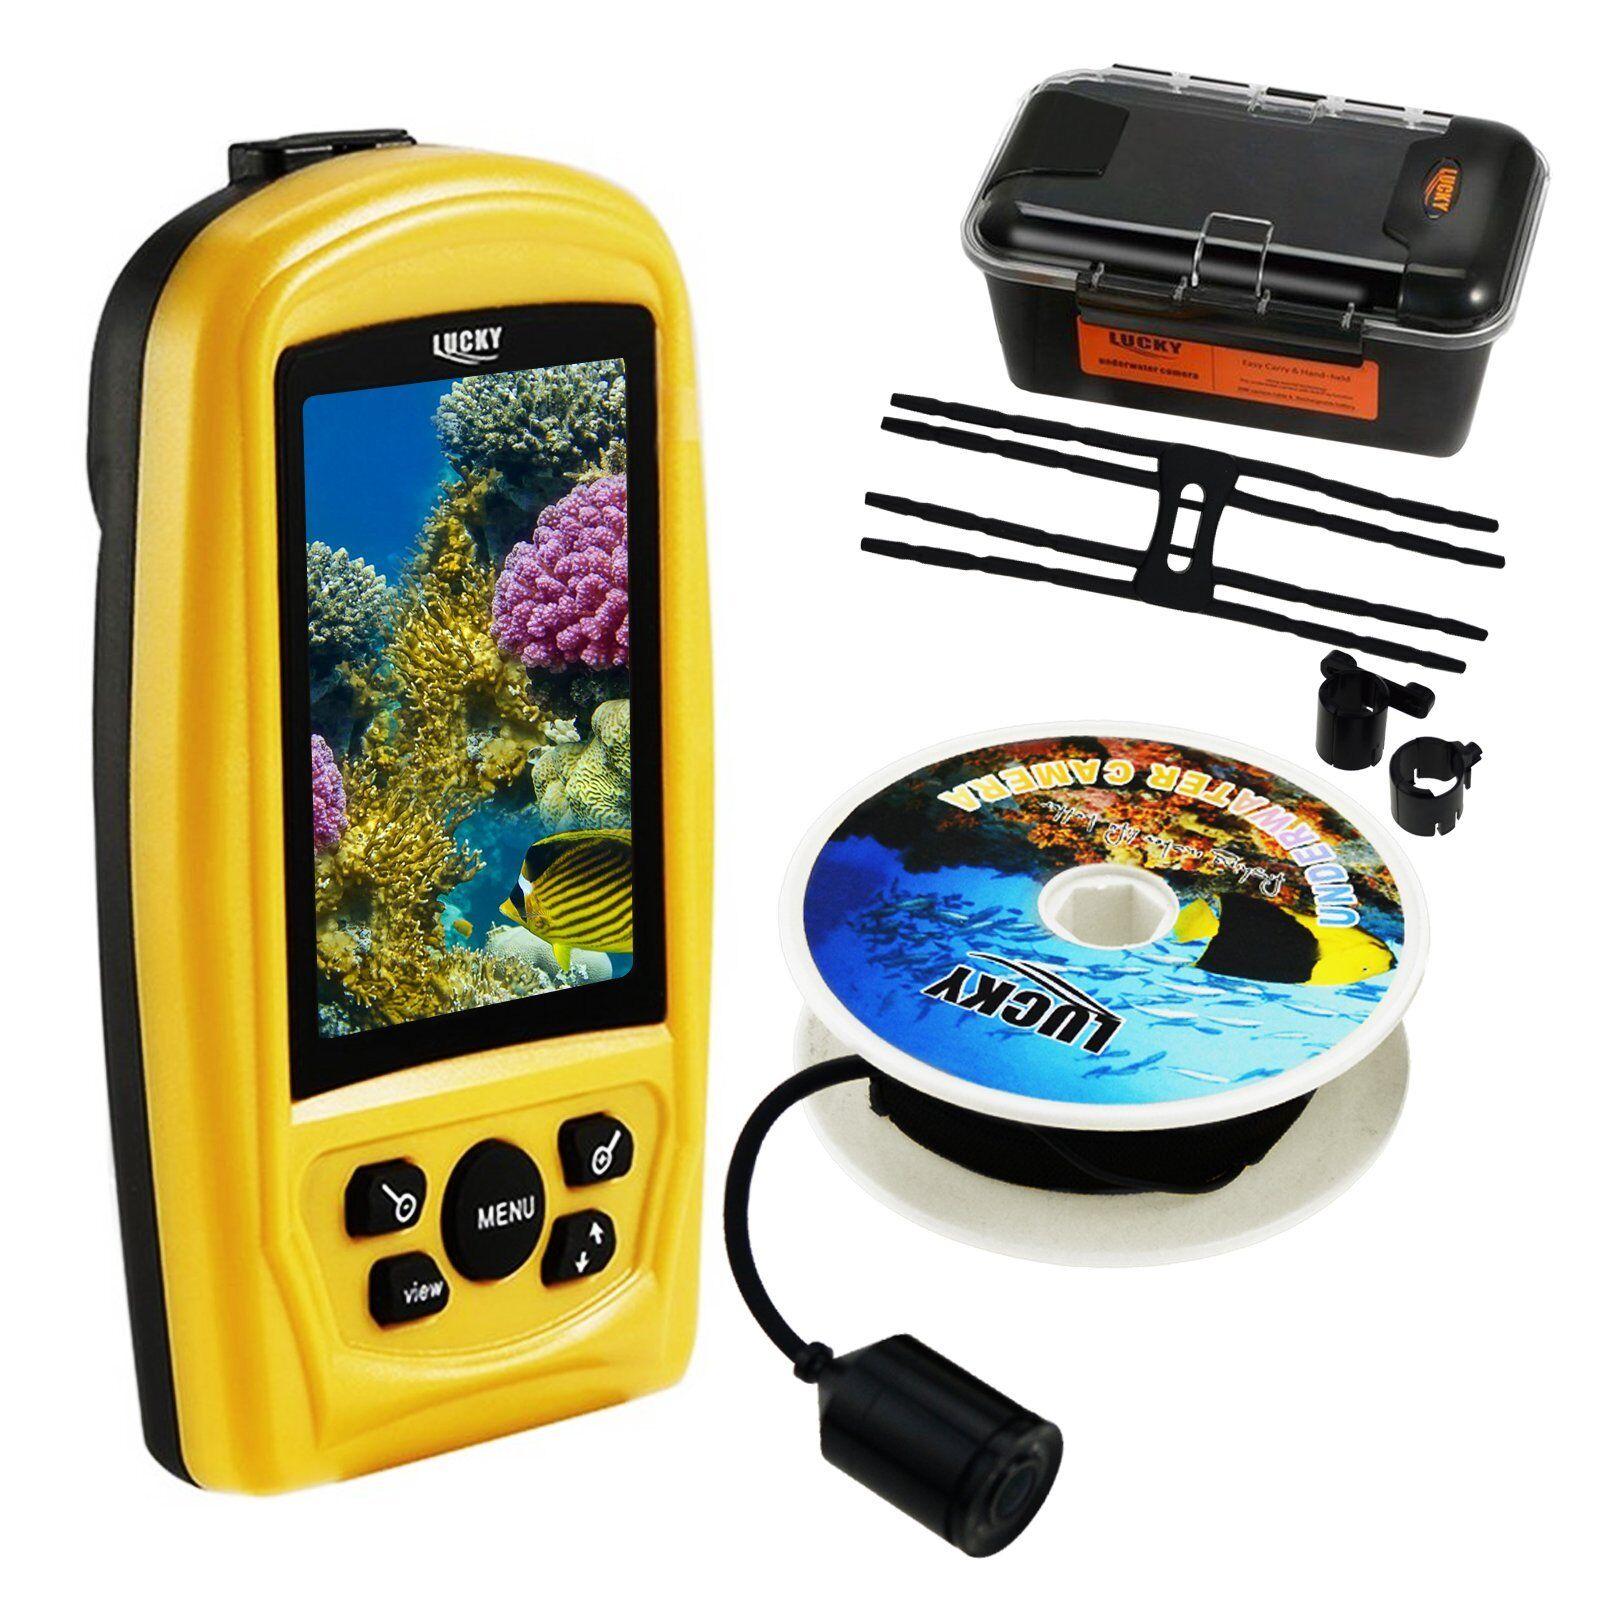 Handheld Farbee Vivere-vista Display Monitor Monitor Display CMD Sensore Pesce Finder Locator da4188